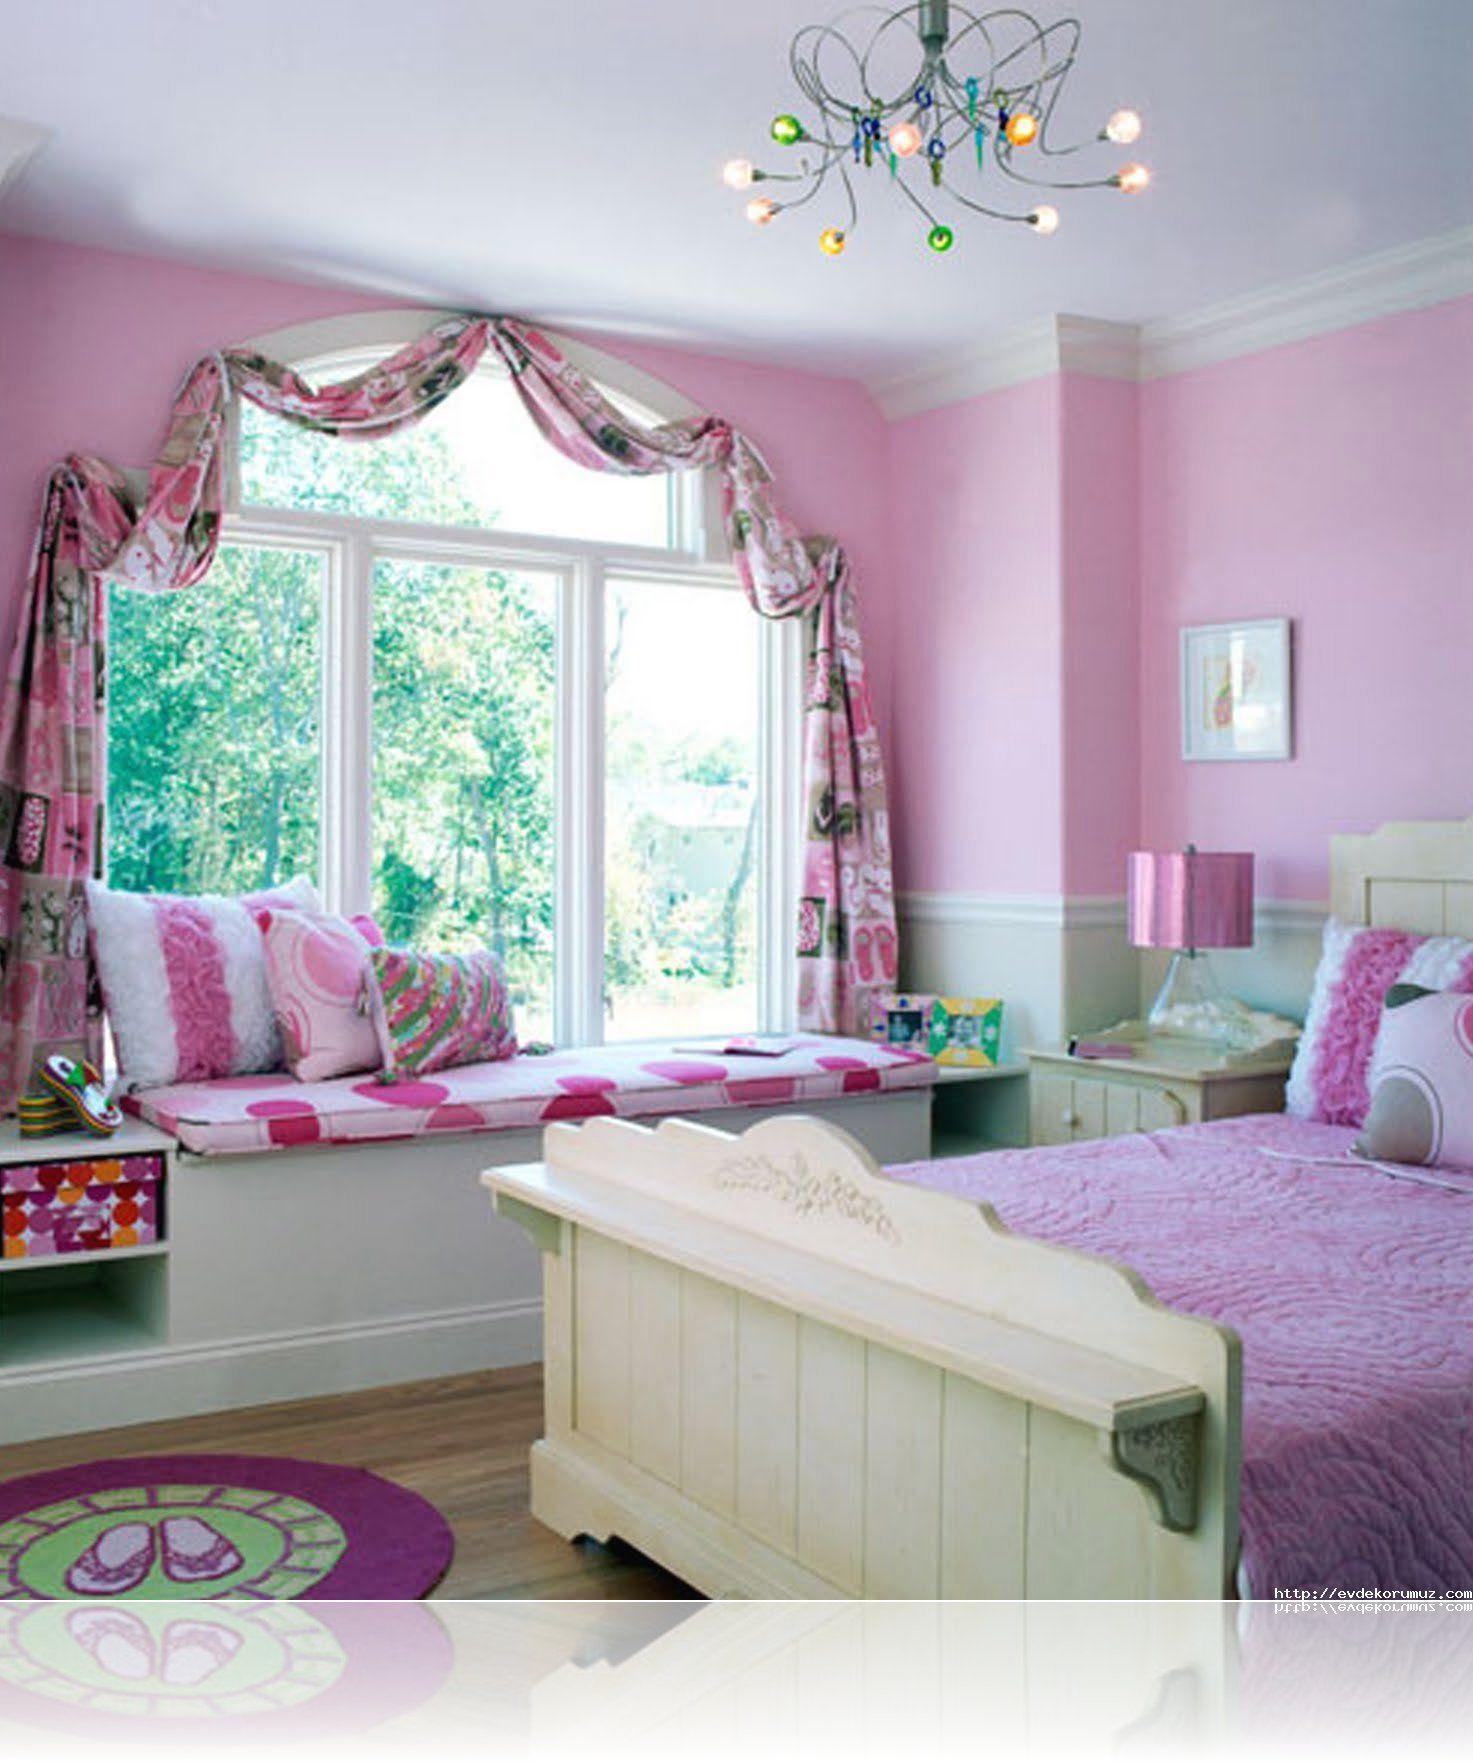 japanese bedroom designs for teen girls | bedroom | pinterest